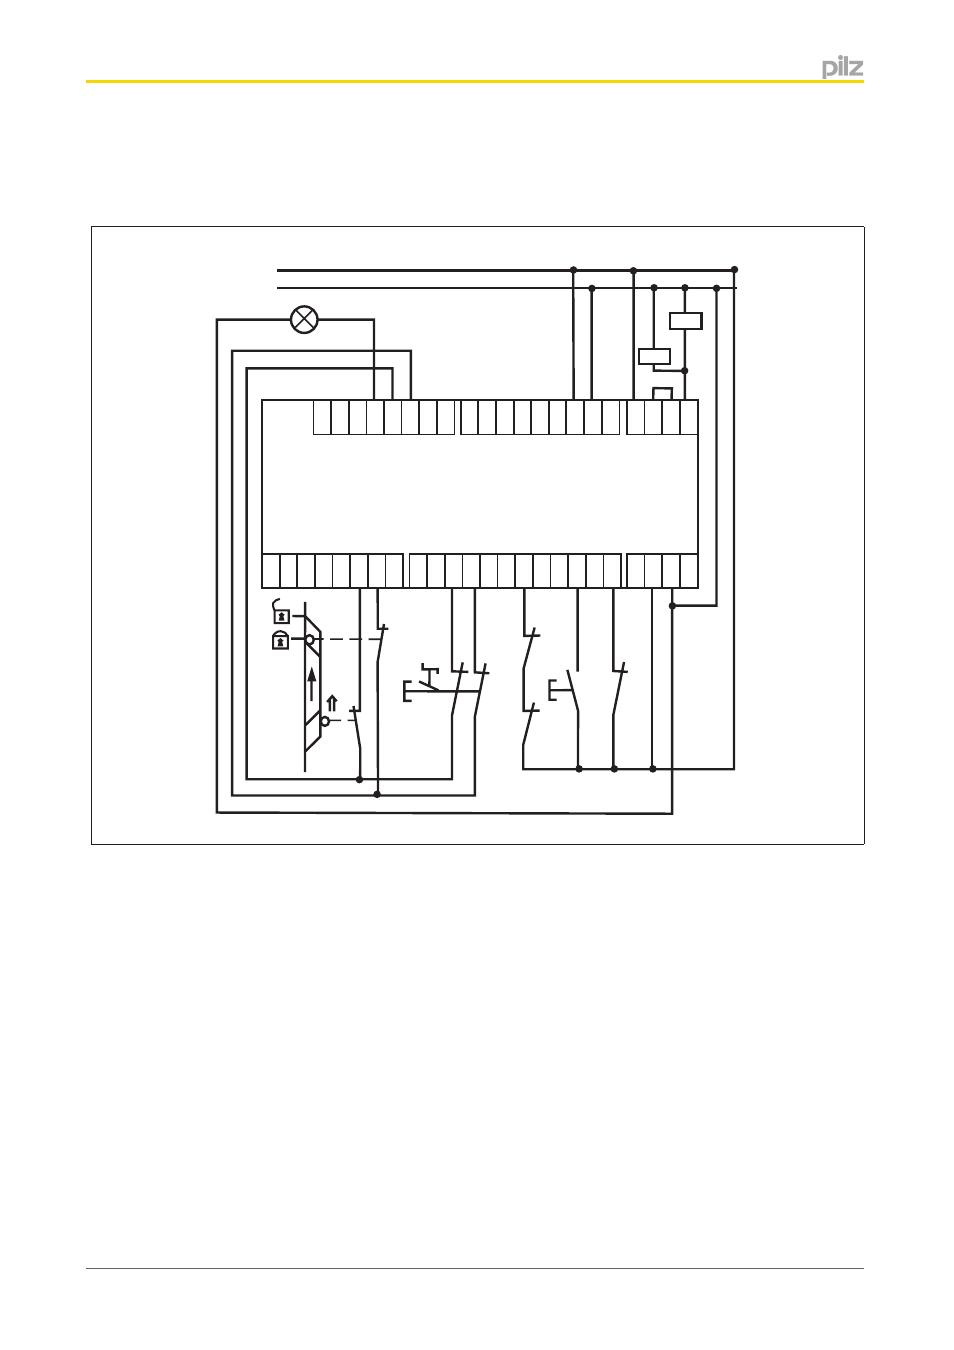 doc025 Pnoz S C Wiring Diagram on